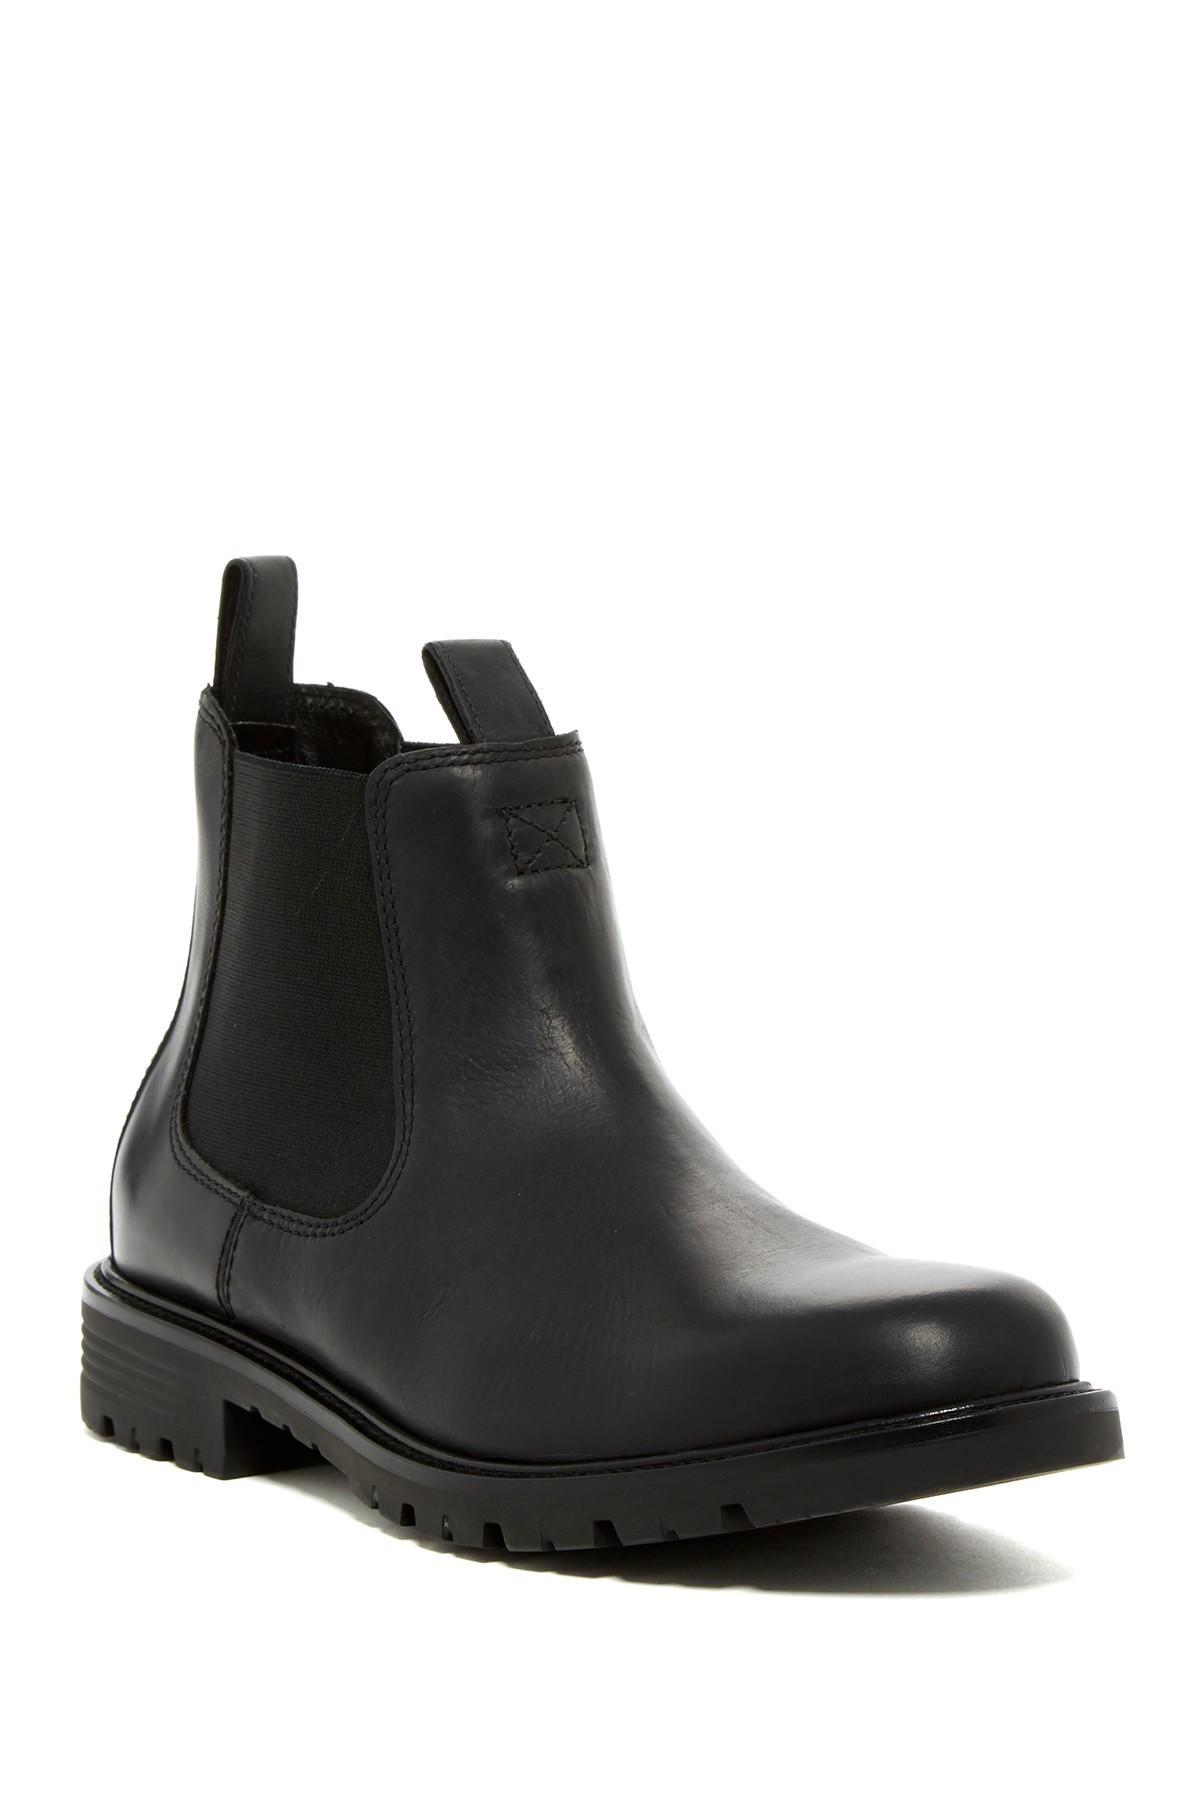 cole haan grantland chelsea boot in black for lyst